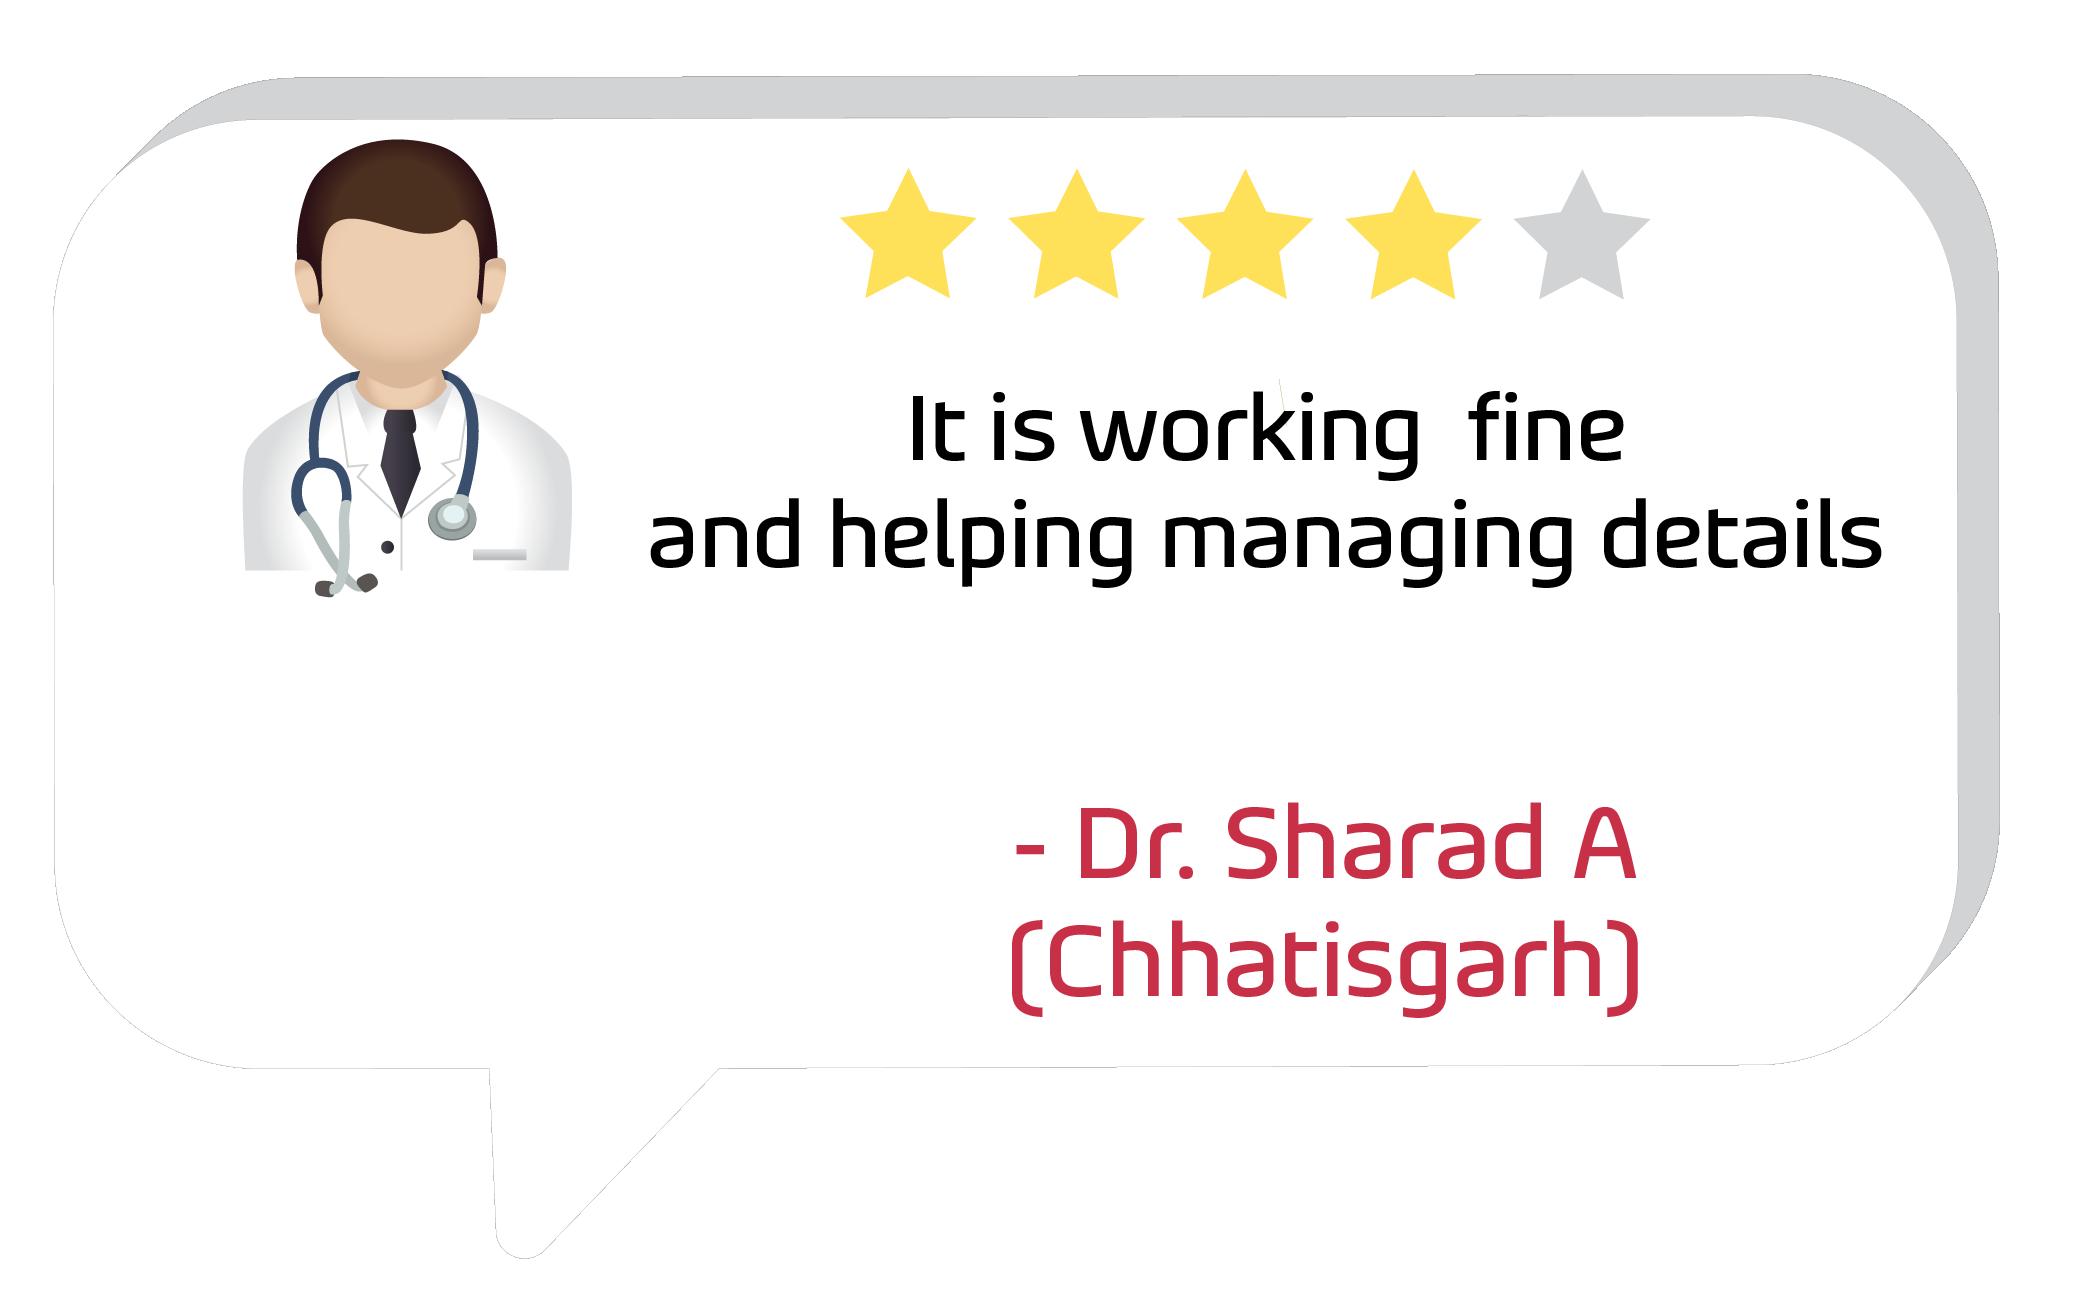 Dr. Sharad A